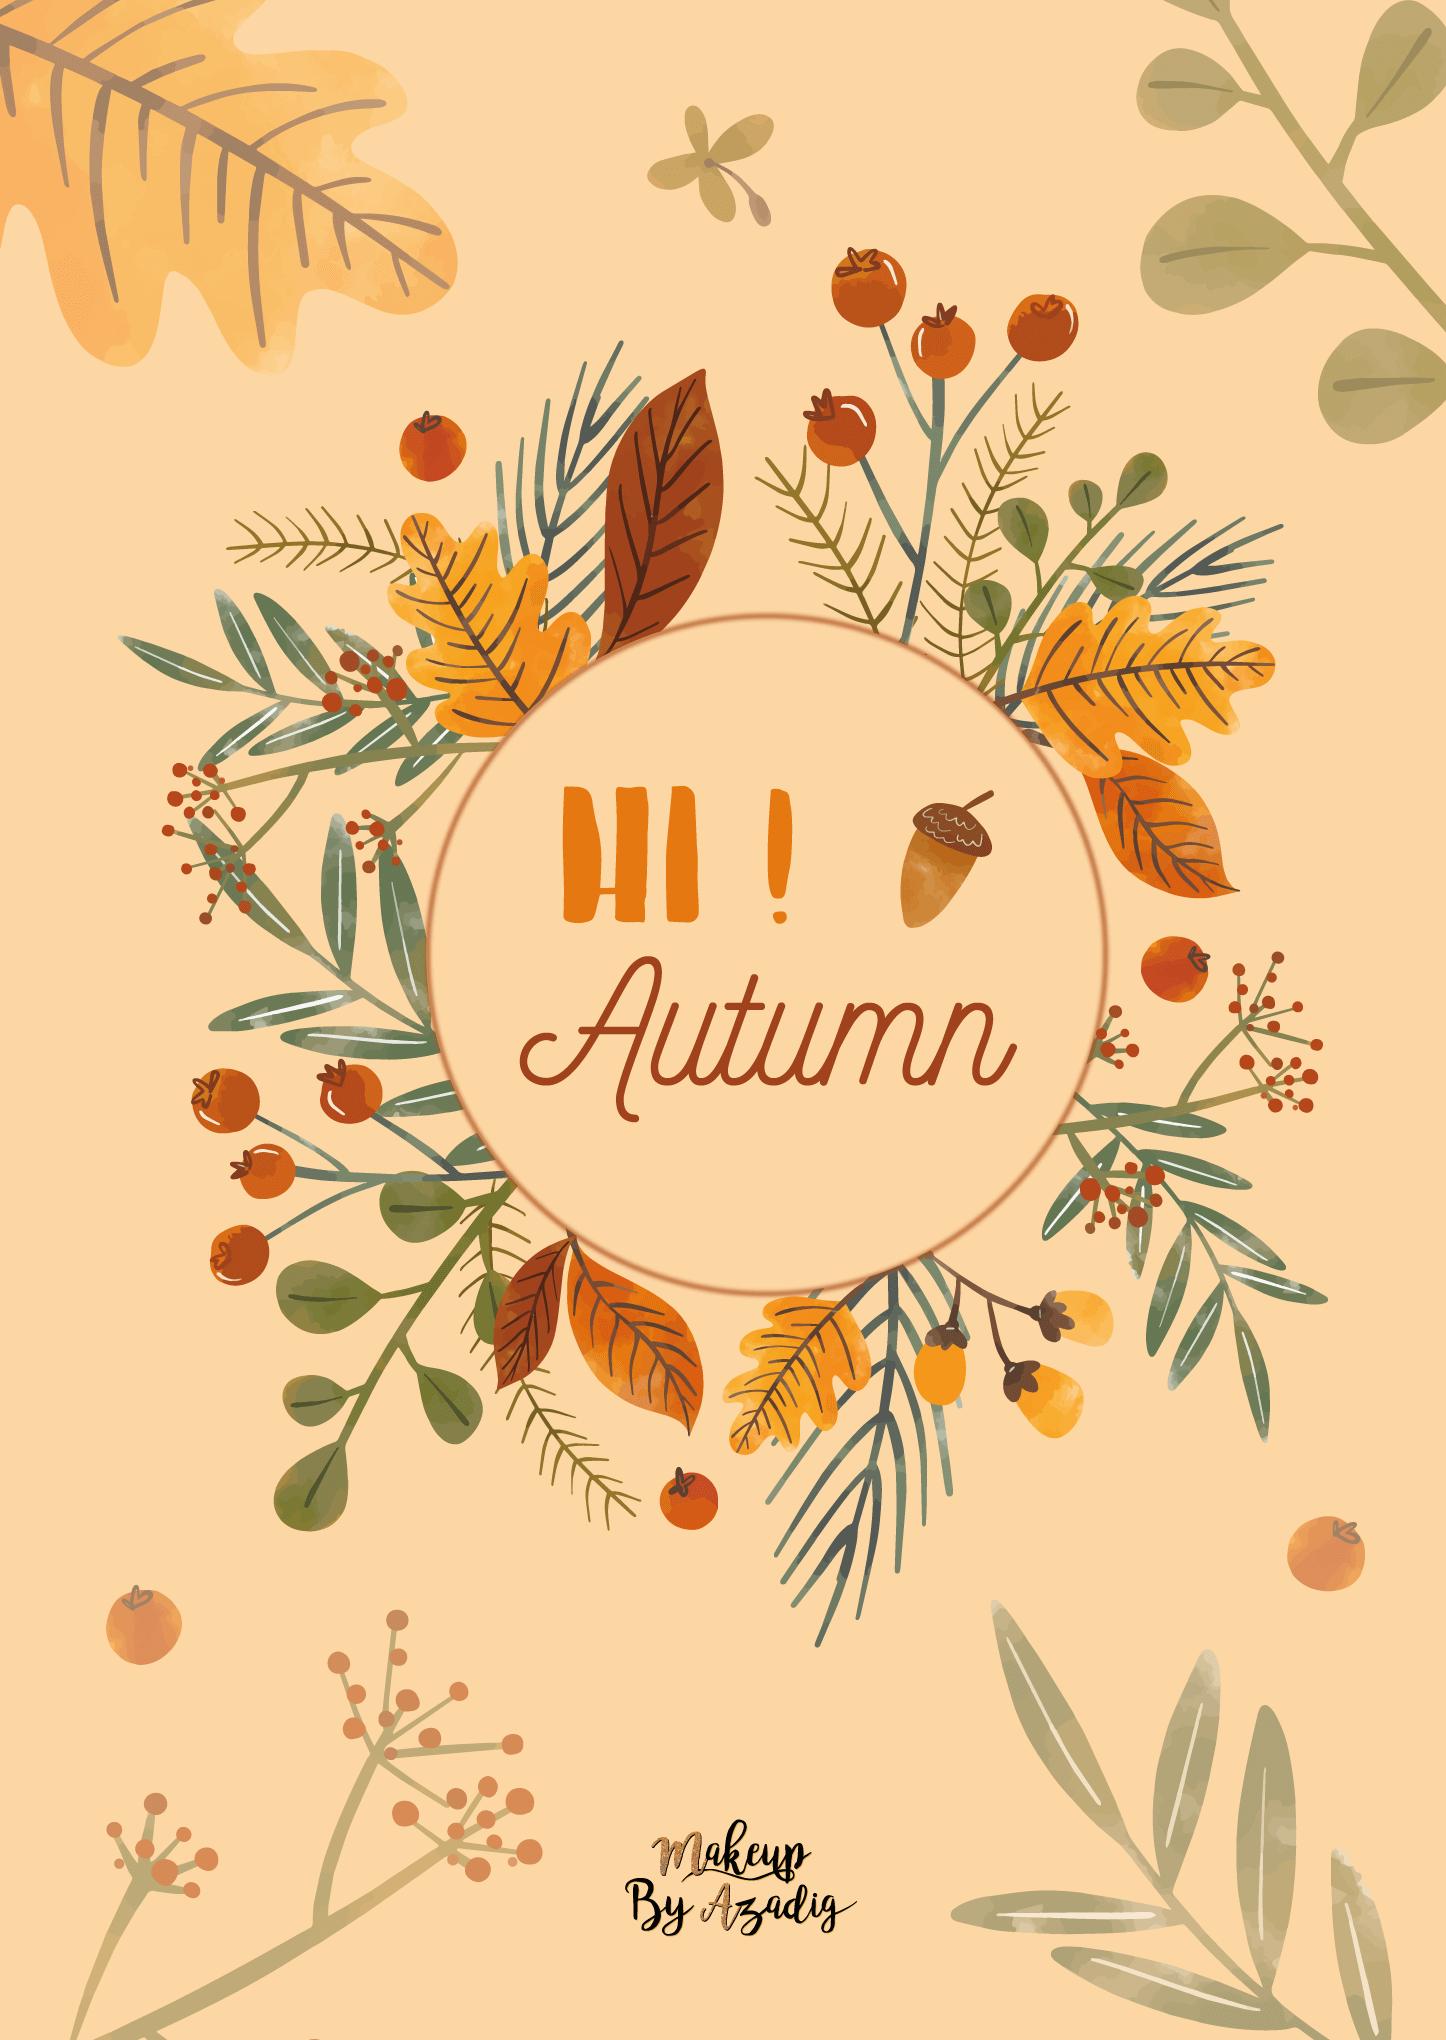 fond-decran-wallpaper-automne-leaves-autumn-girly-ipad-tablette-apple-makeupbyazadig-tendance